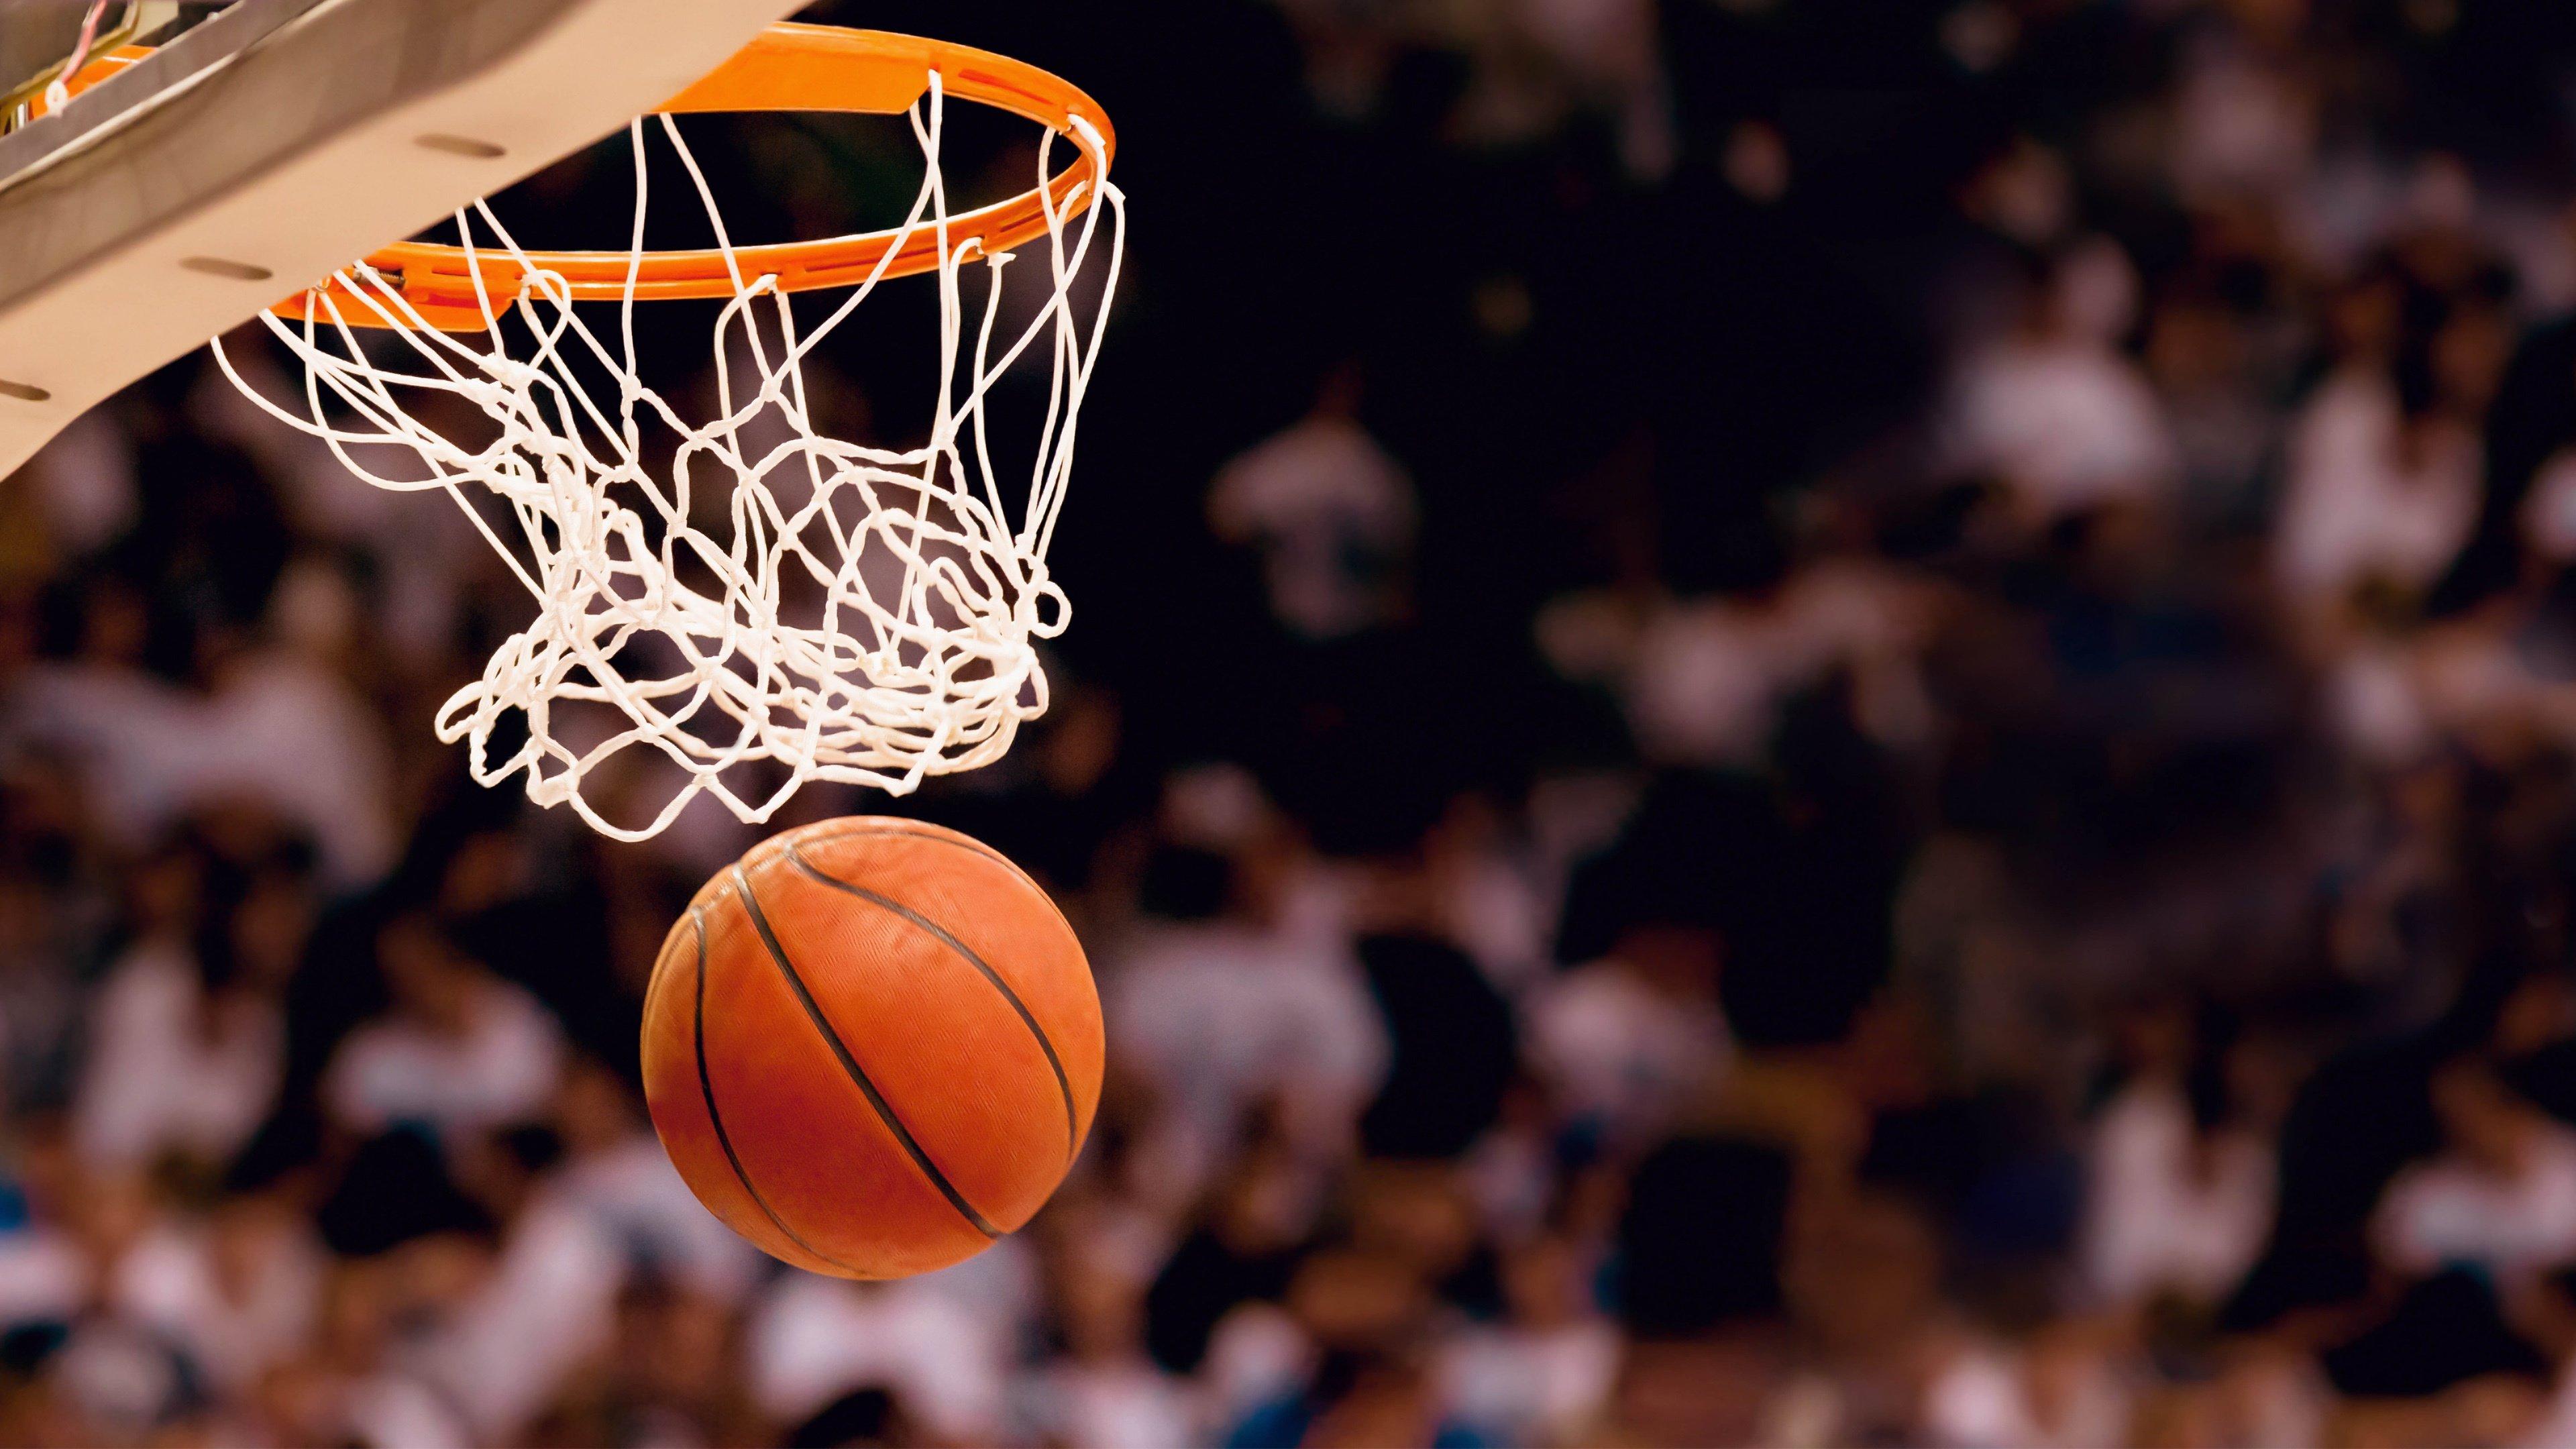 High Resolution Basketball Ultra Hd 4k Wallpaper Id 156530 For